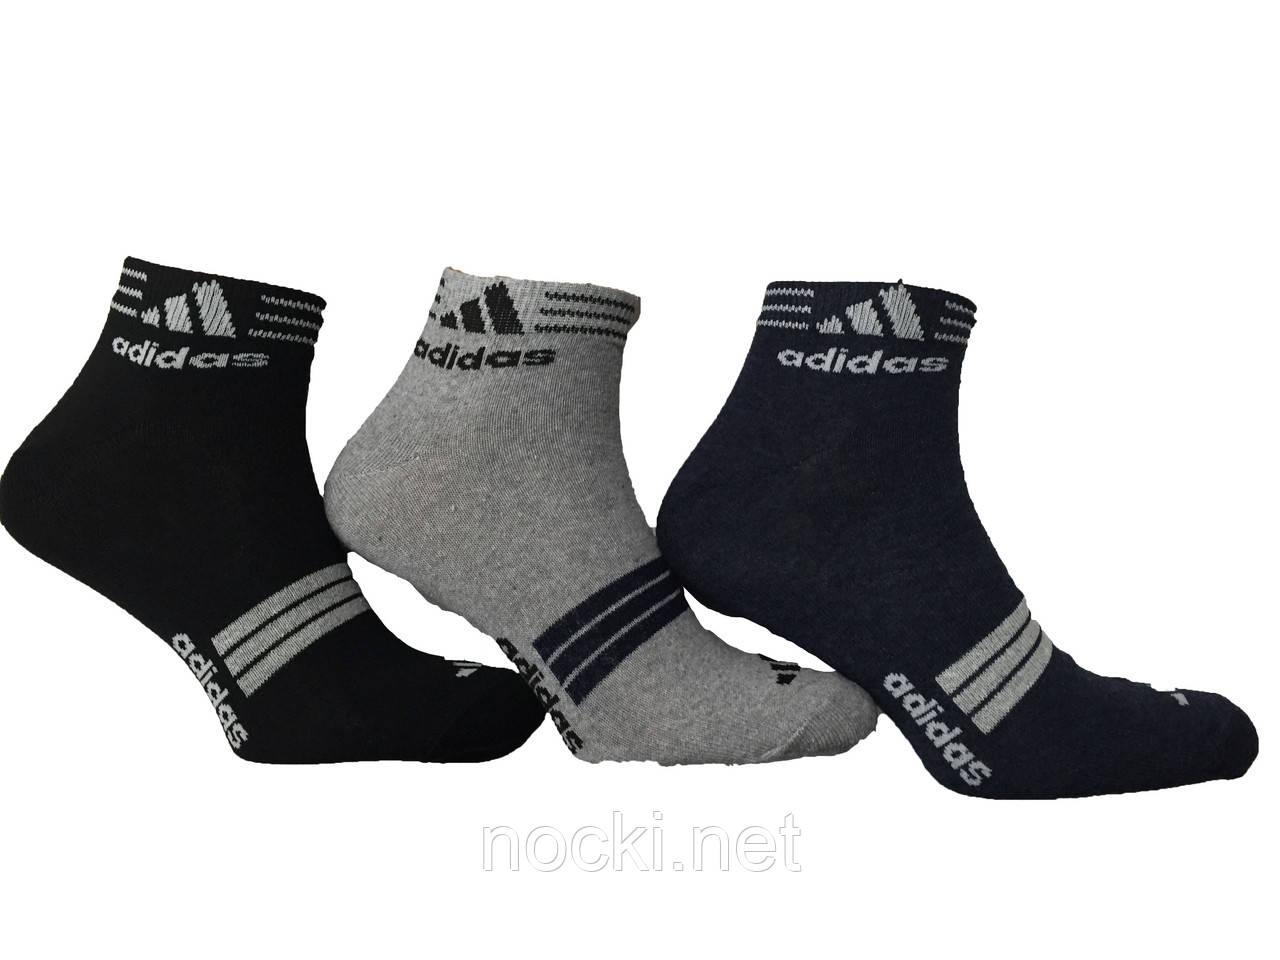 ad9b561ac1e4 Носки мужские спорт укороченные Adidas пр-во Турция: продажа, цена в  Харькове. ...